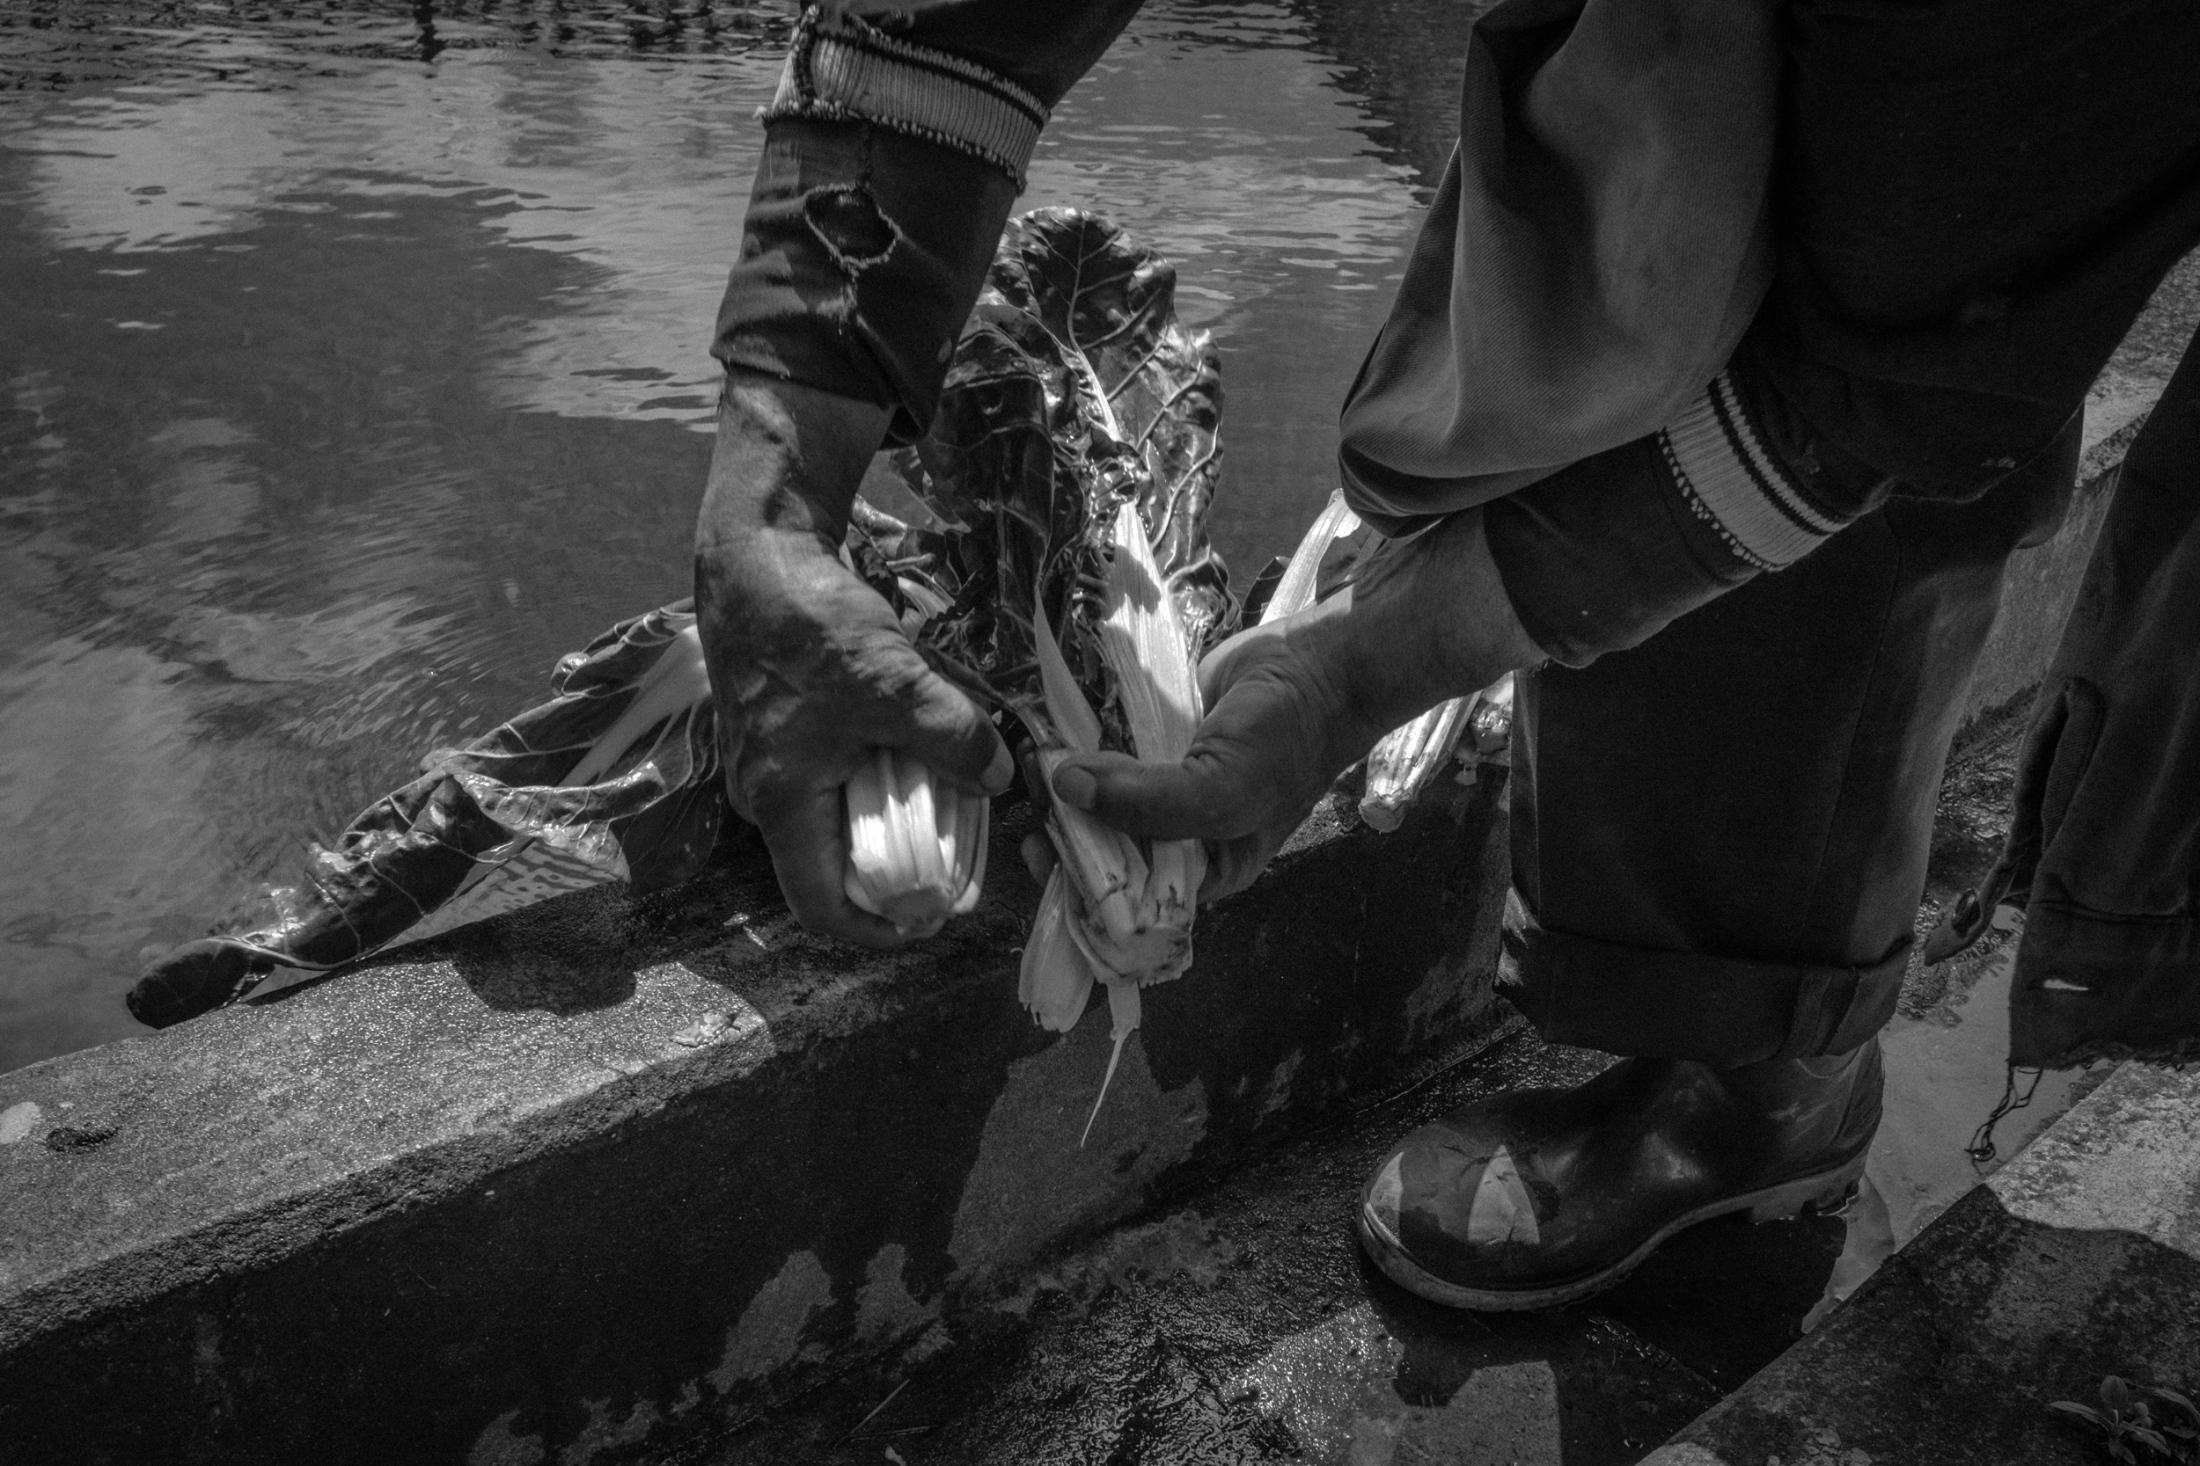 Art and Documentary Photography - Loading ZuletaR__os_CarangasYElJaguar_012.JPG